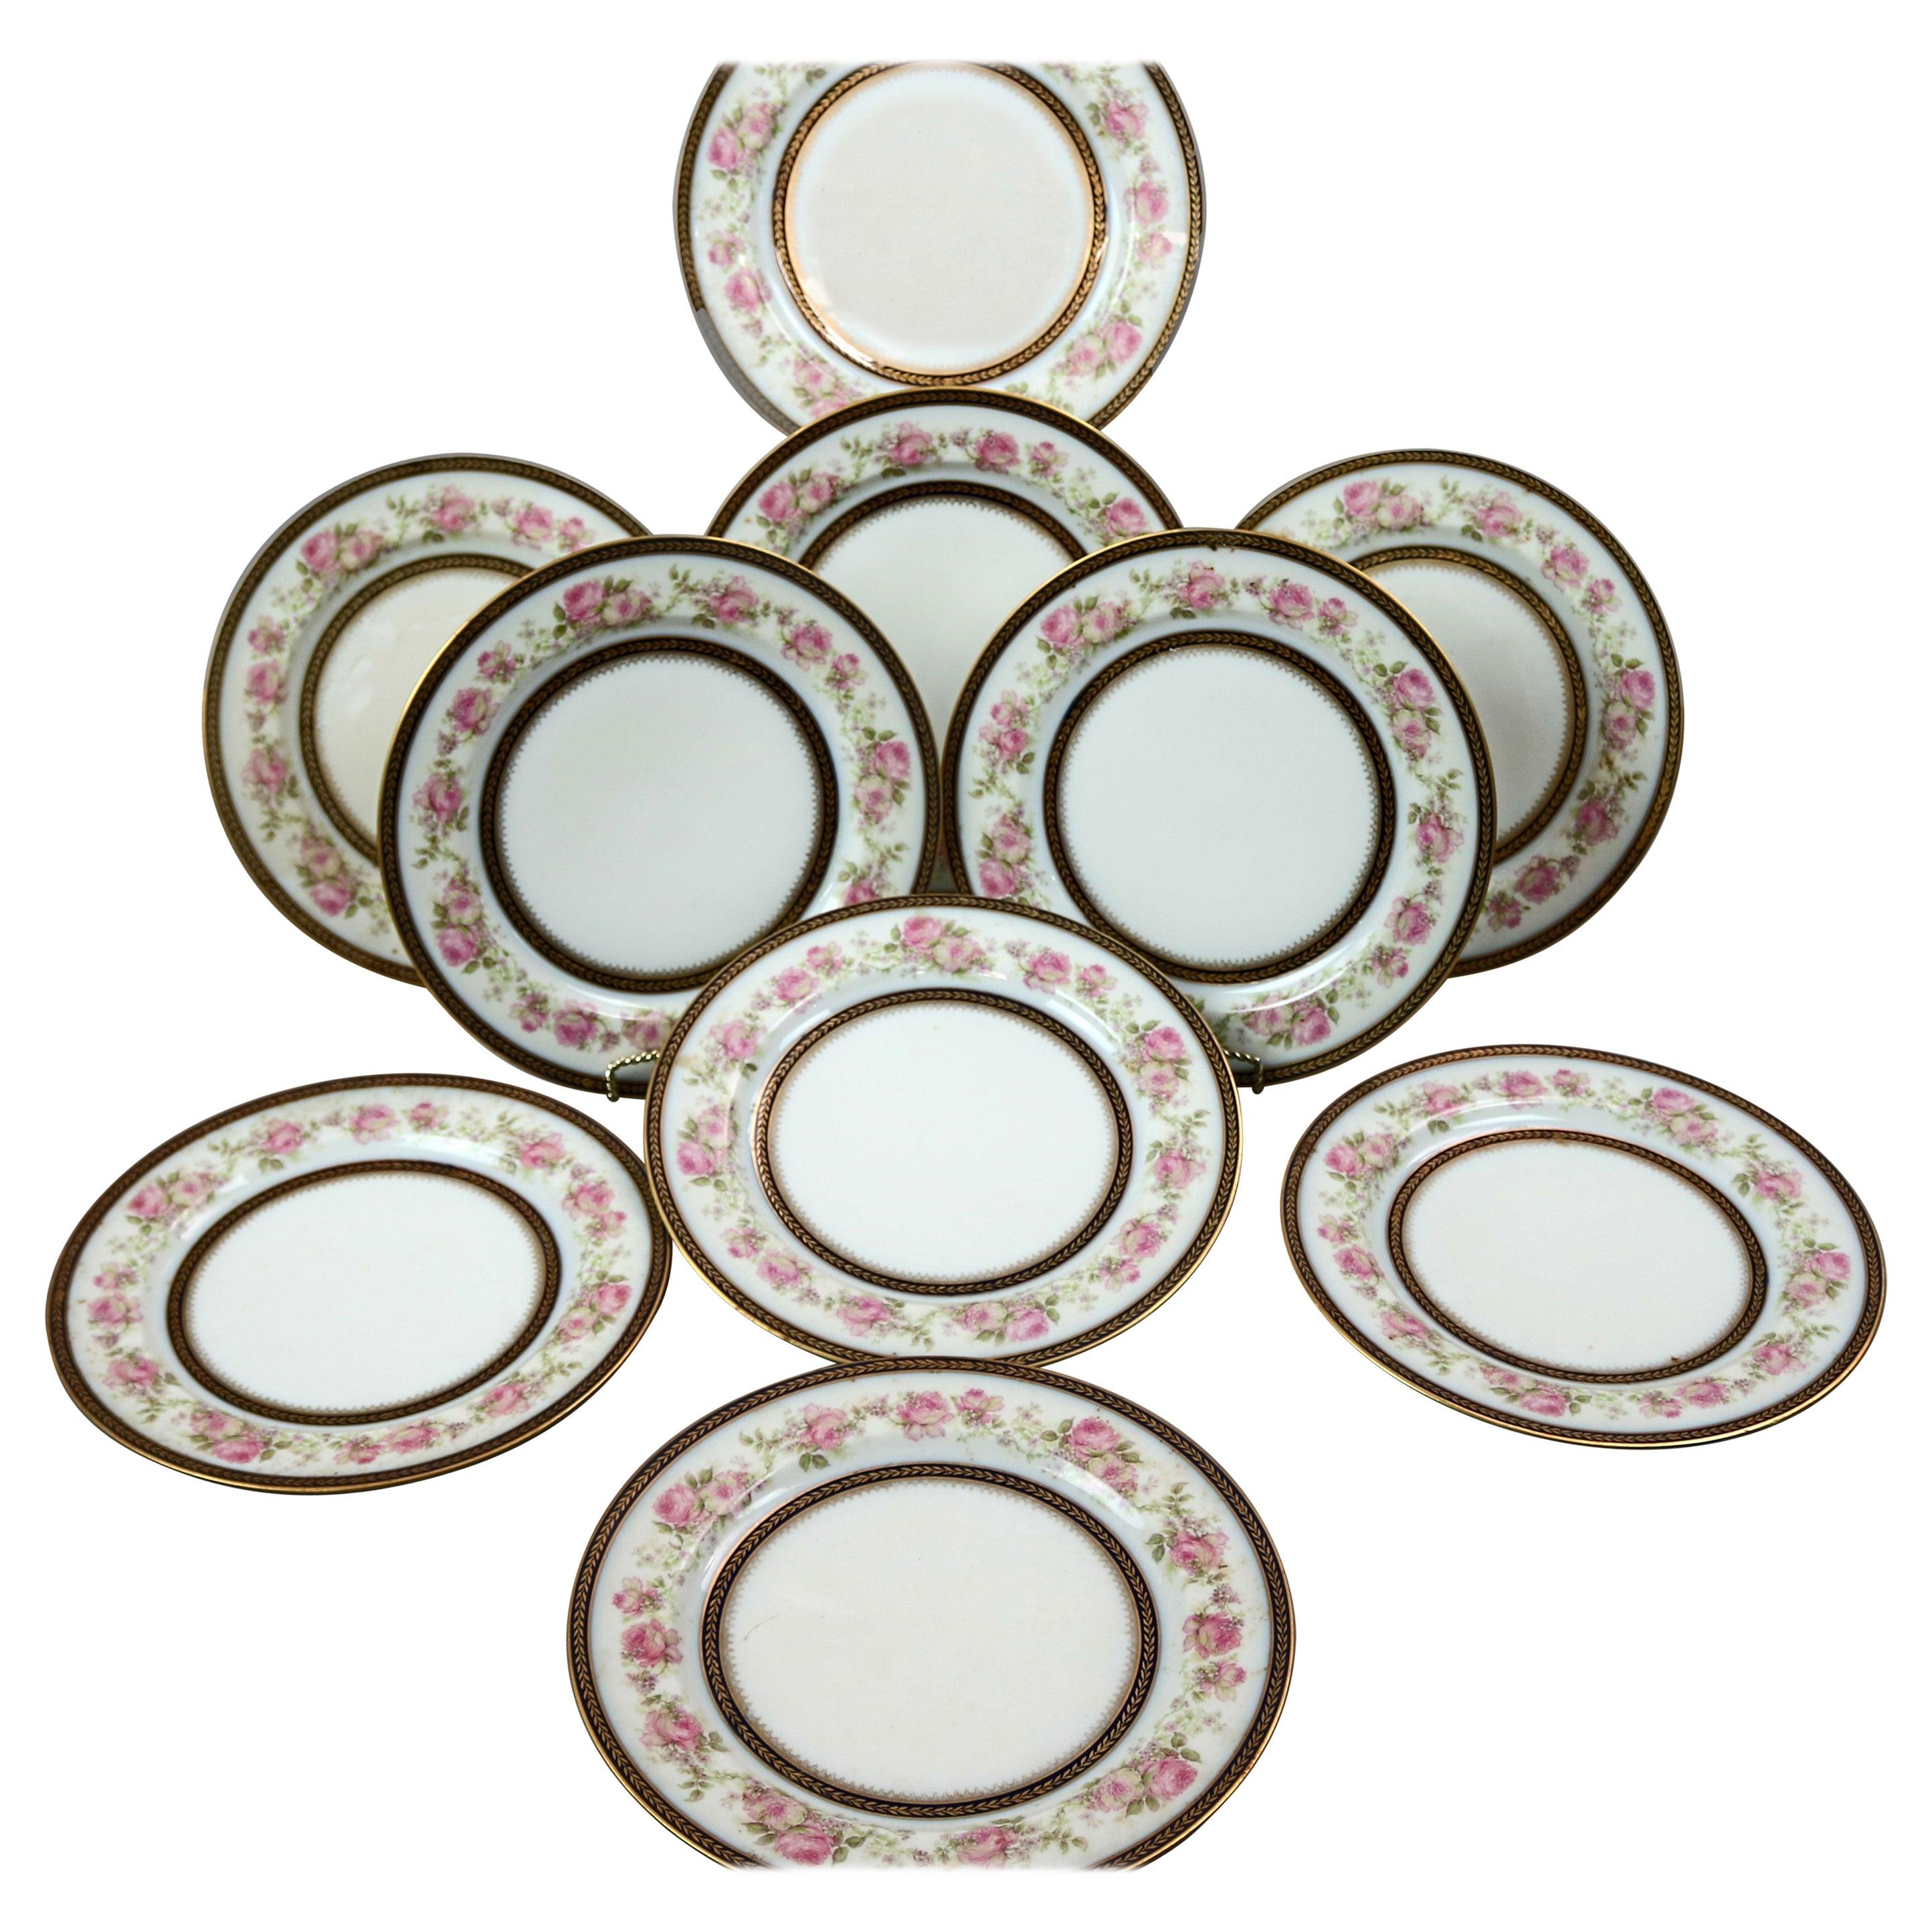 Set of 10 French Haviland Limoges Floral Hand Painted Porcelain Plates